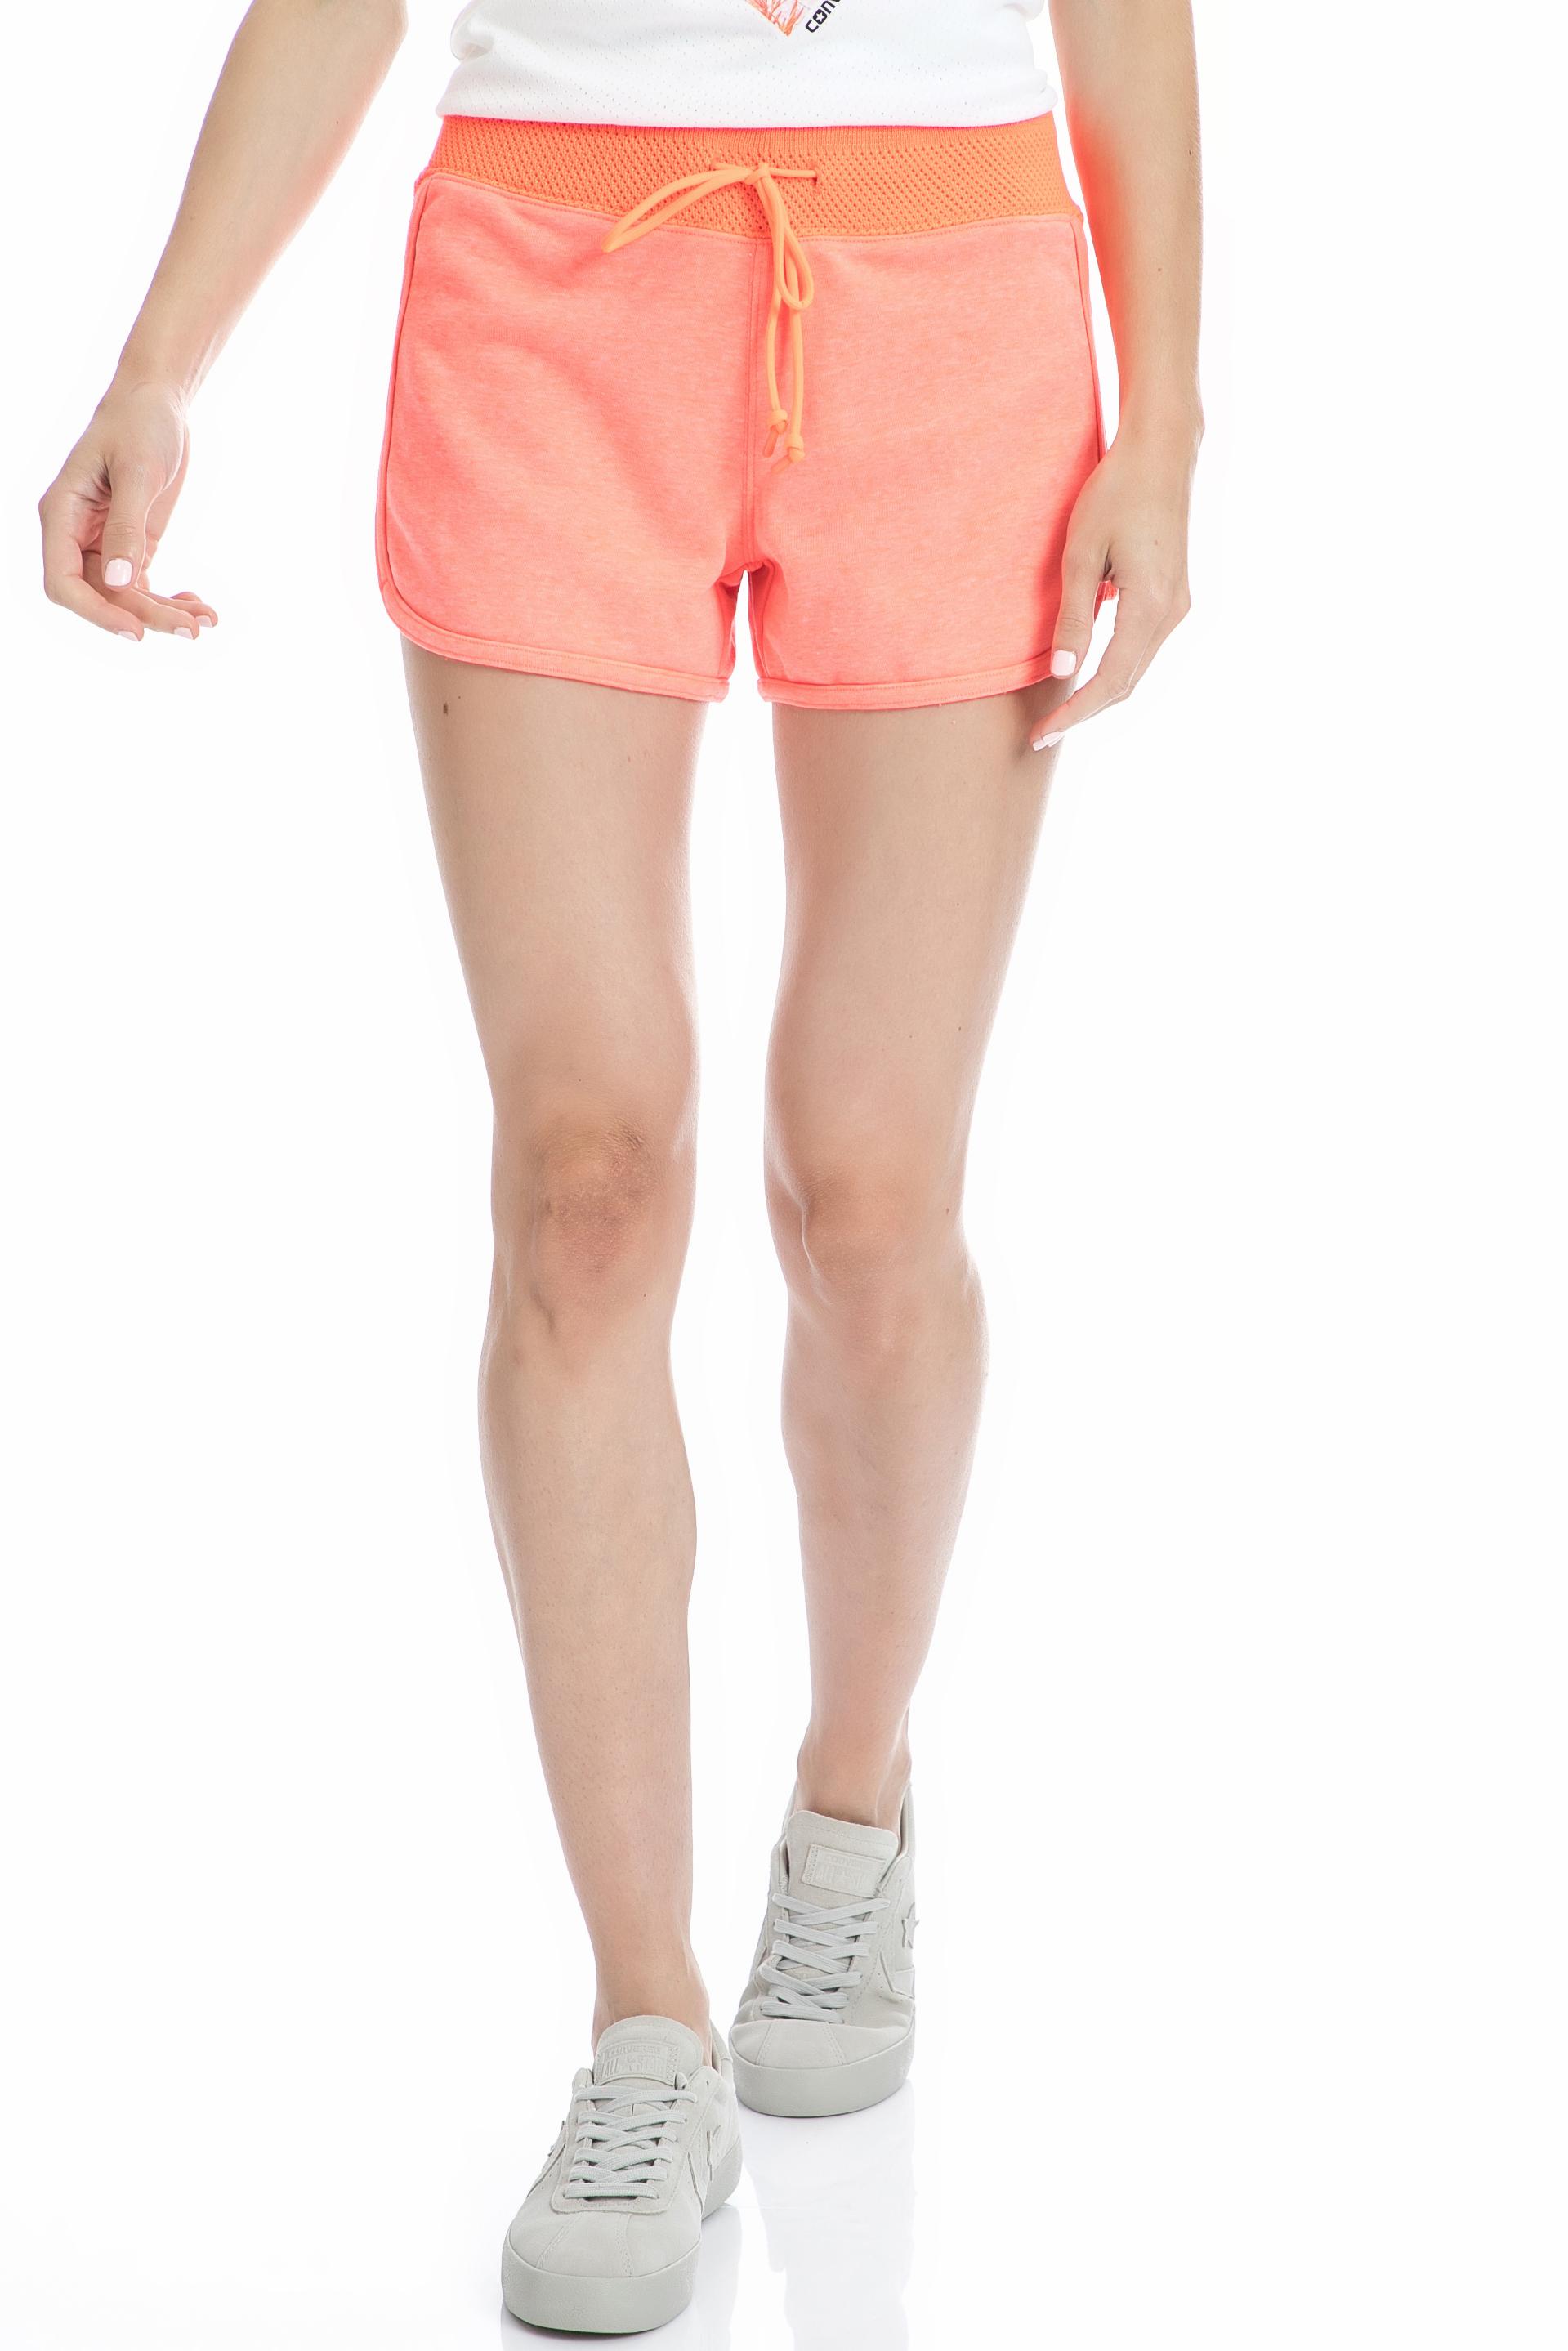 CONVERSE - Γυναικείο σορτς Converse πορτοκαλί γυναικεία ρούχα σορτς βερμούδες αθλητικά